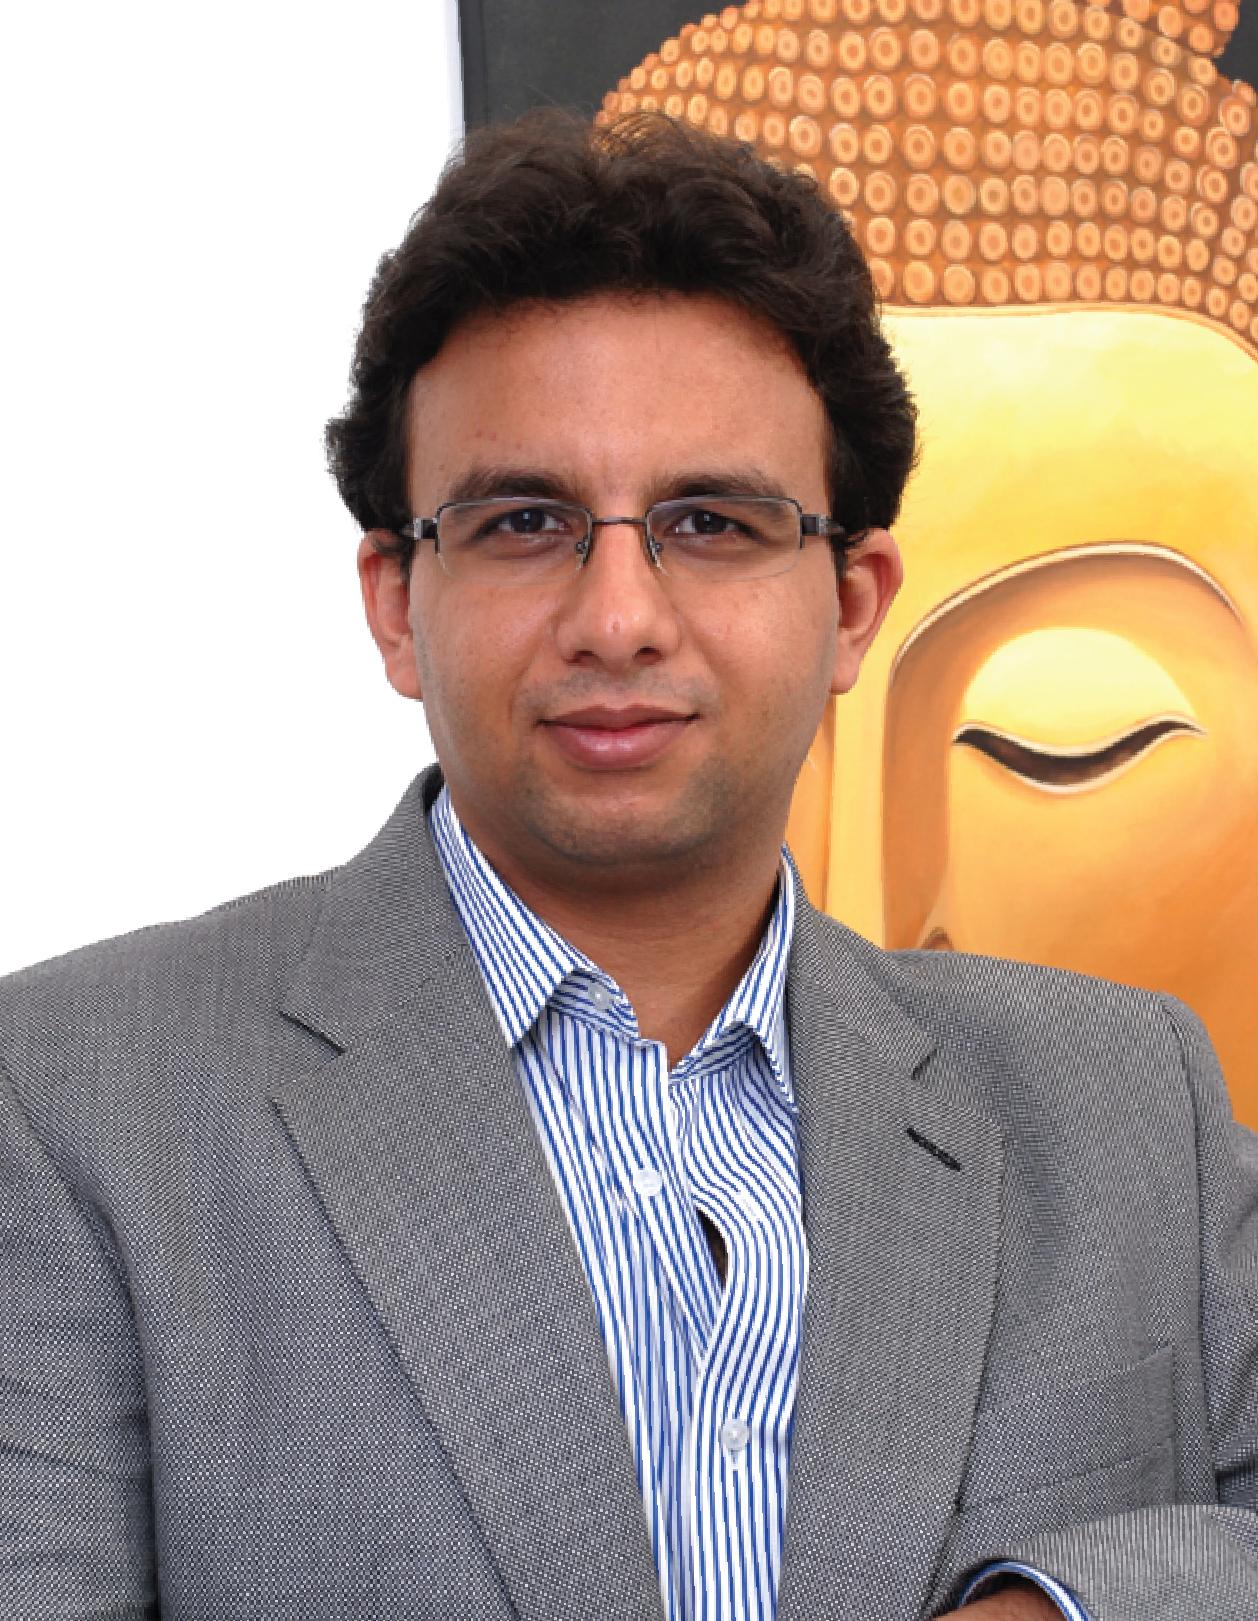 Architect Behzad Kharas